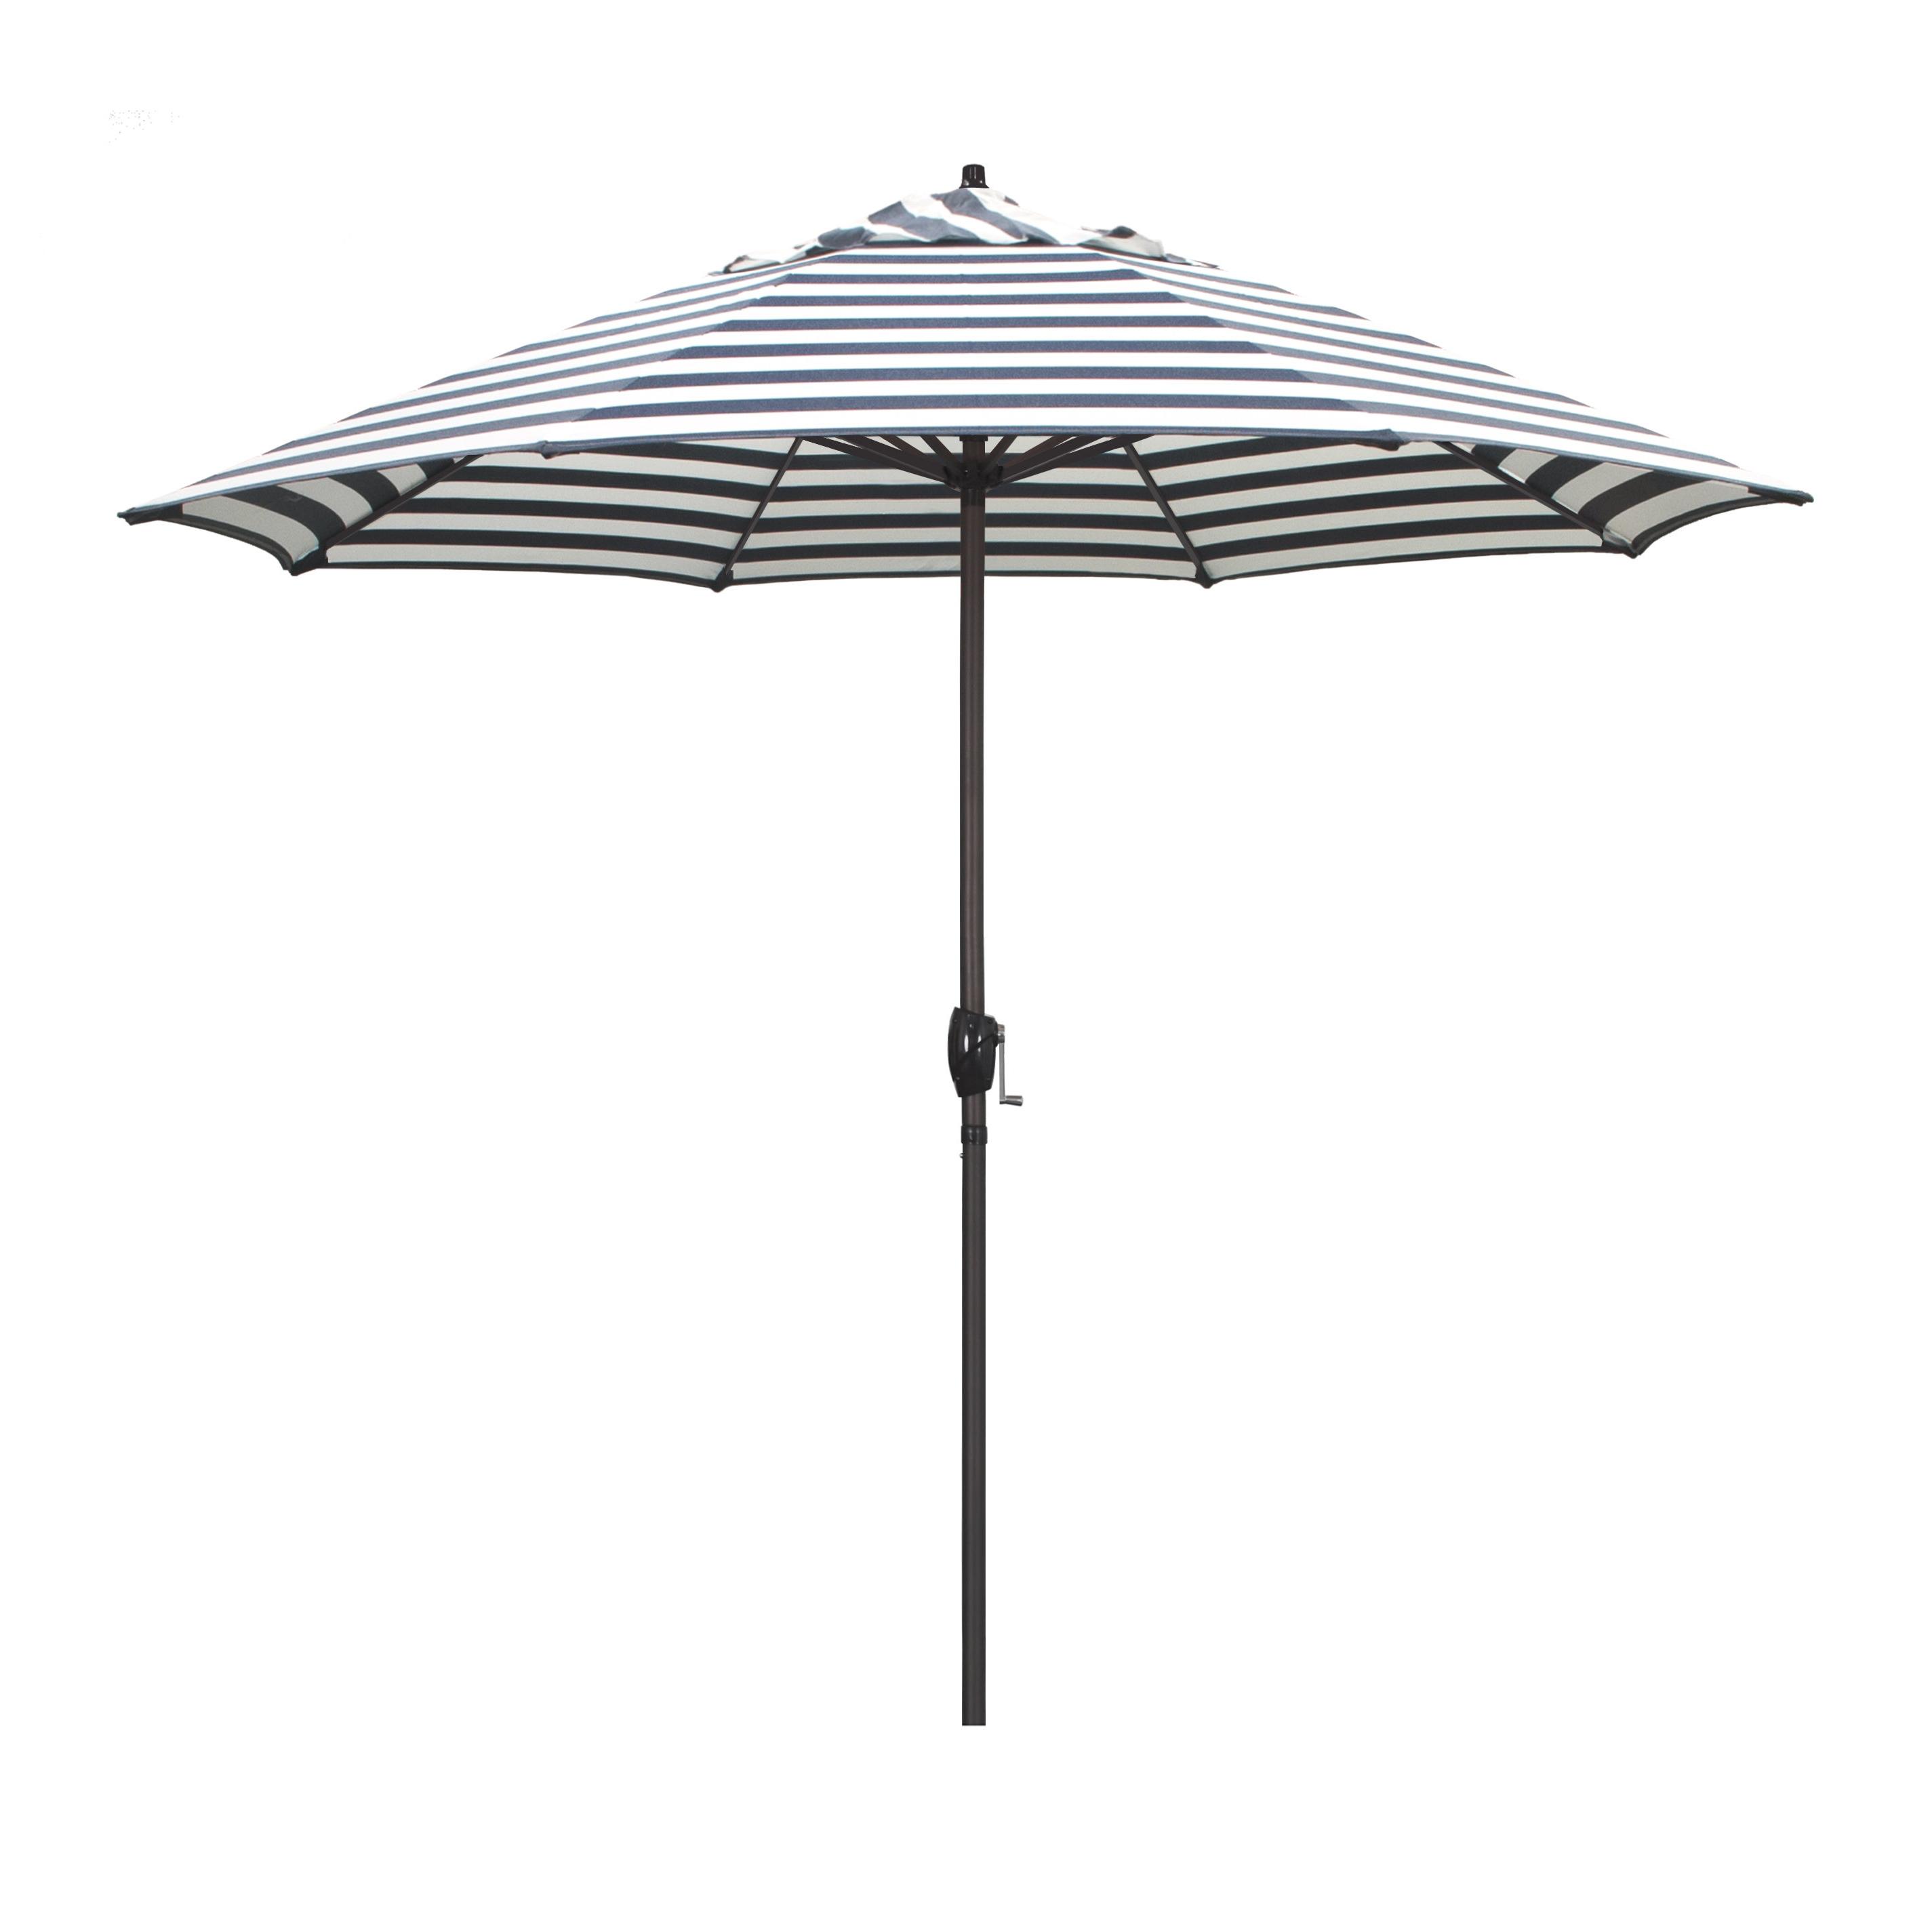 Pedrick Drape Market Umbrellas With Regard To Most Recently Released Sol 72 Outdoor Cardine 9' Market Umbrella (View 16 of 20)